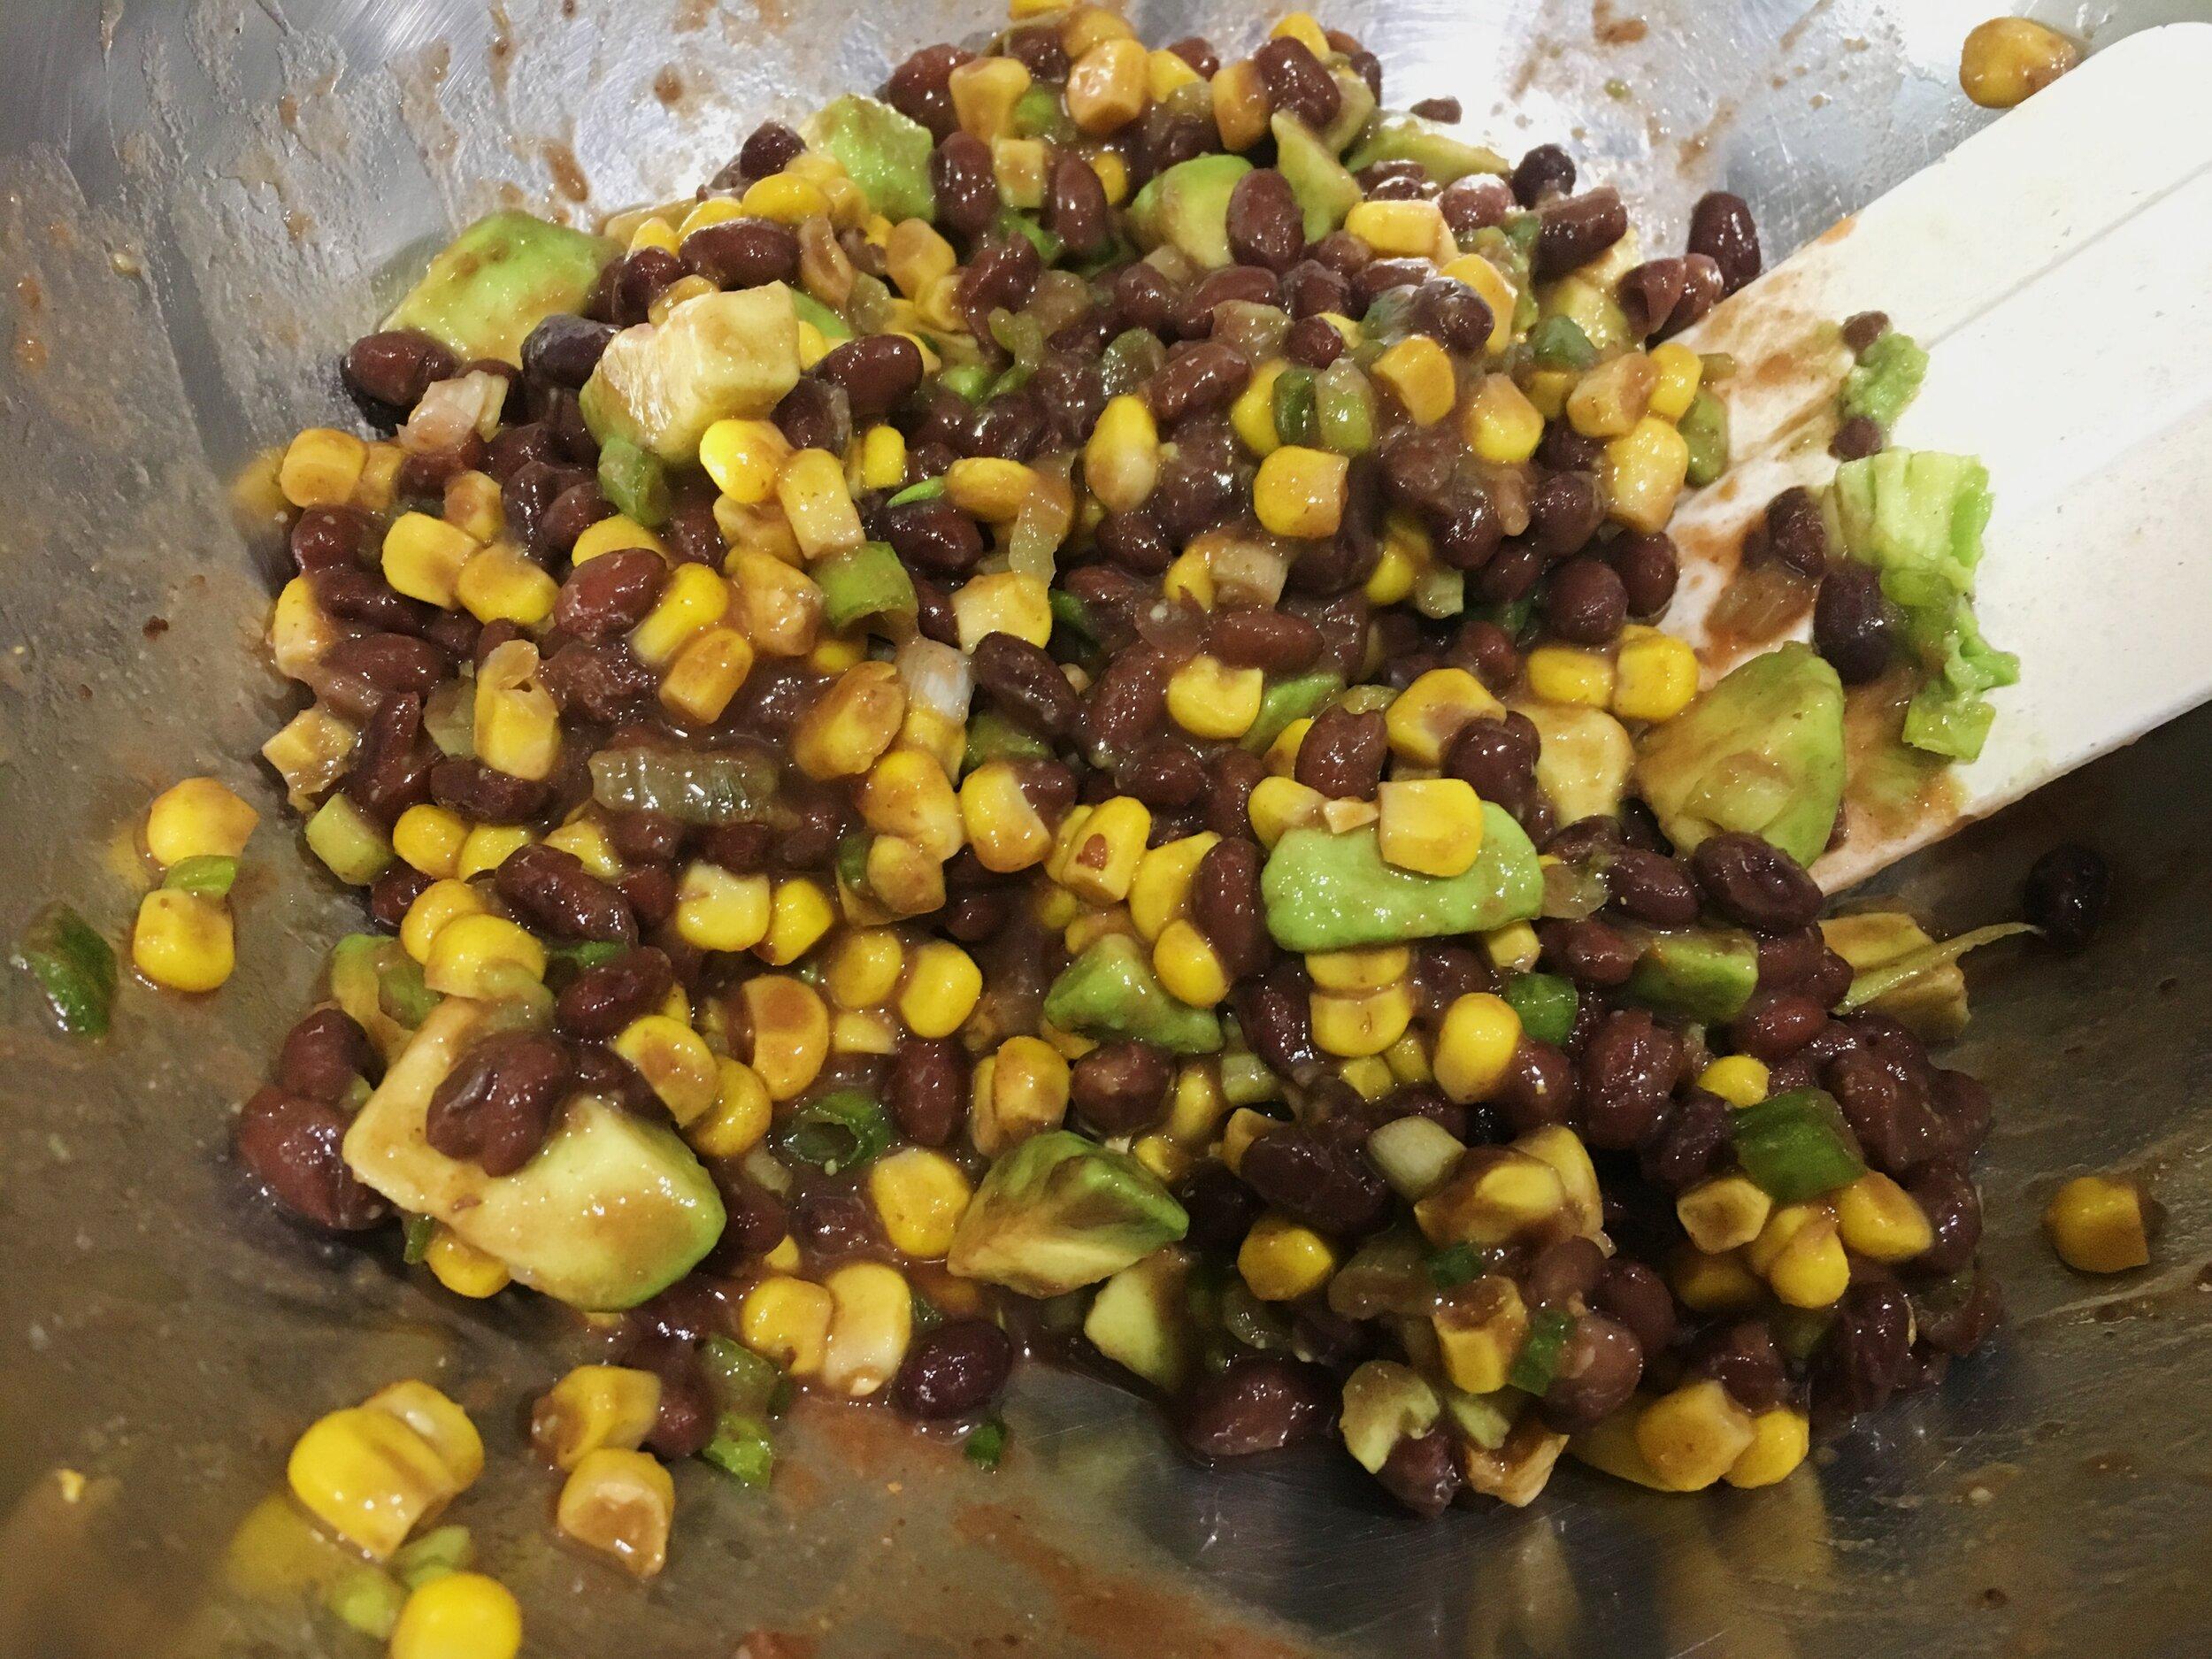 Step 2: - In a medium bowl, combine the black beans, corn, tomato sauce, scallions, cumin, cayenne, and salt.